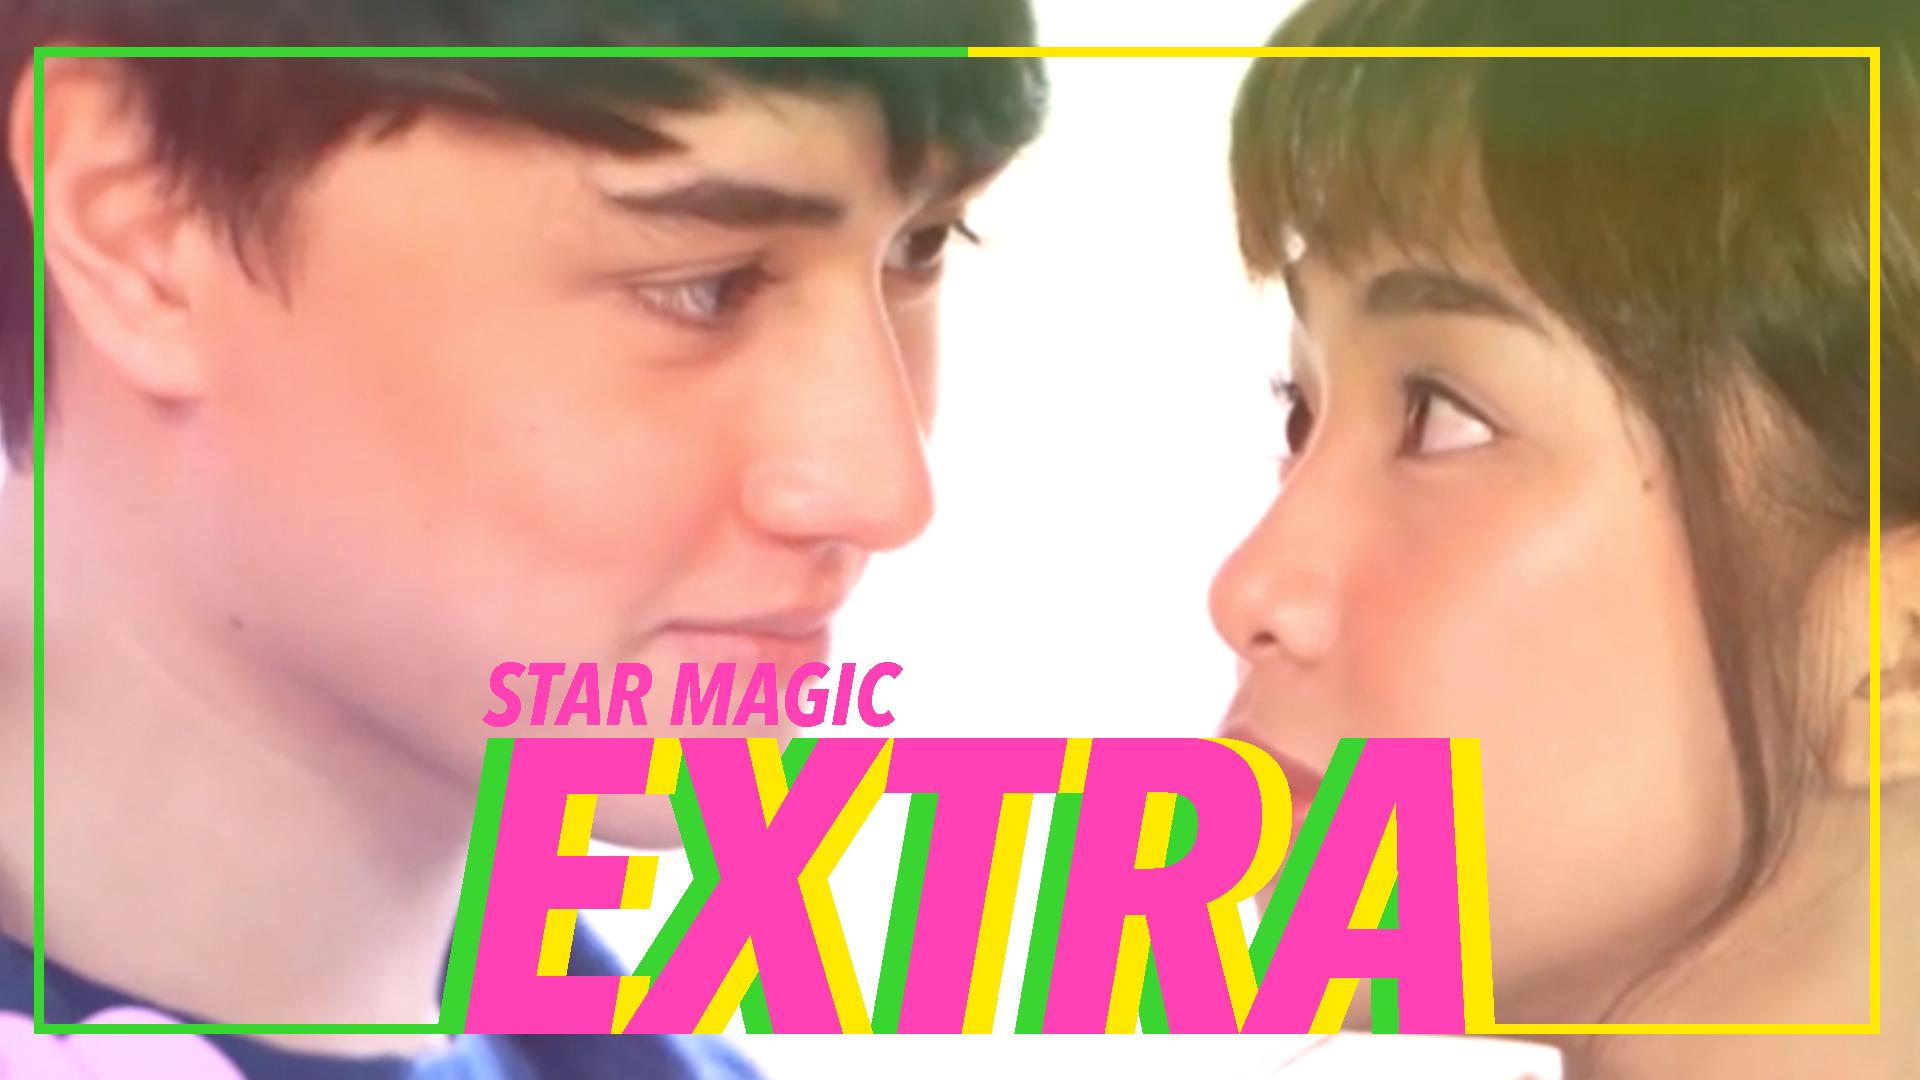 Star Magic Extra: Issue No. 2